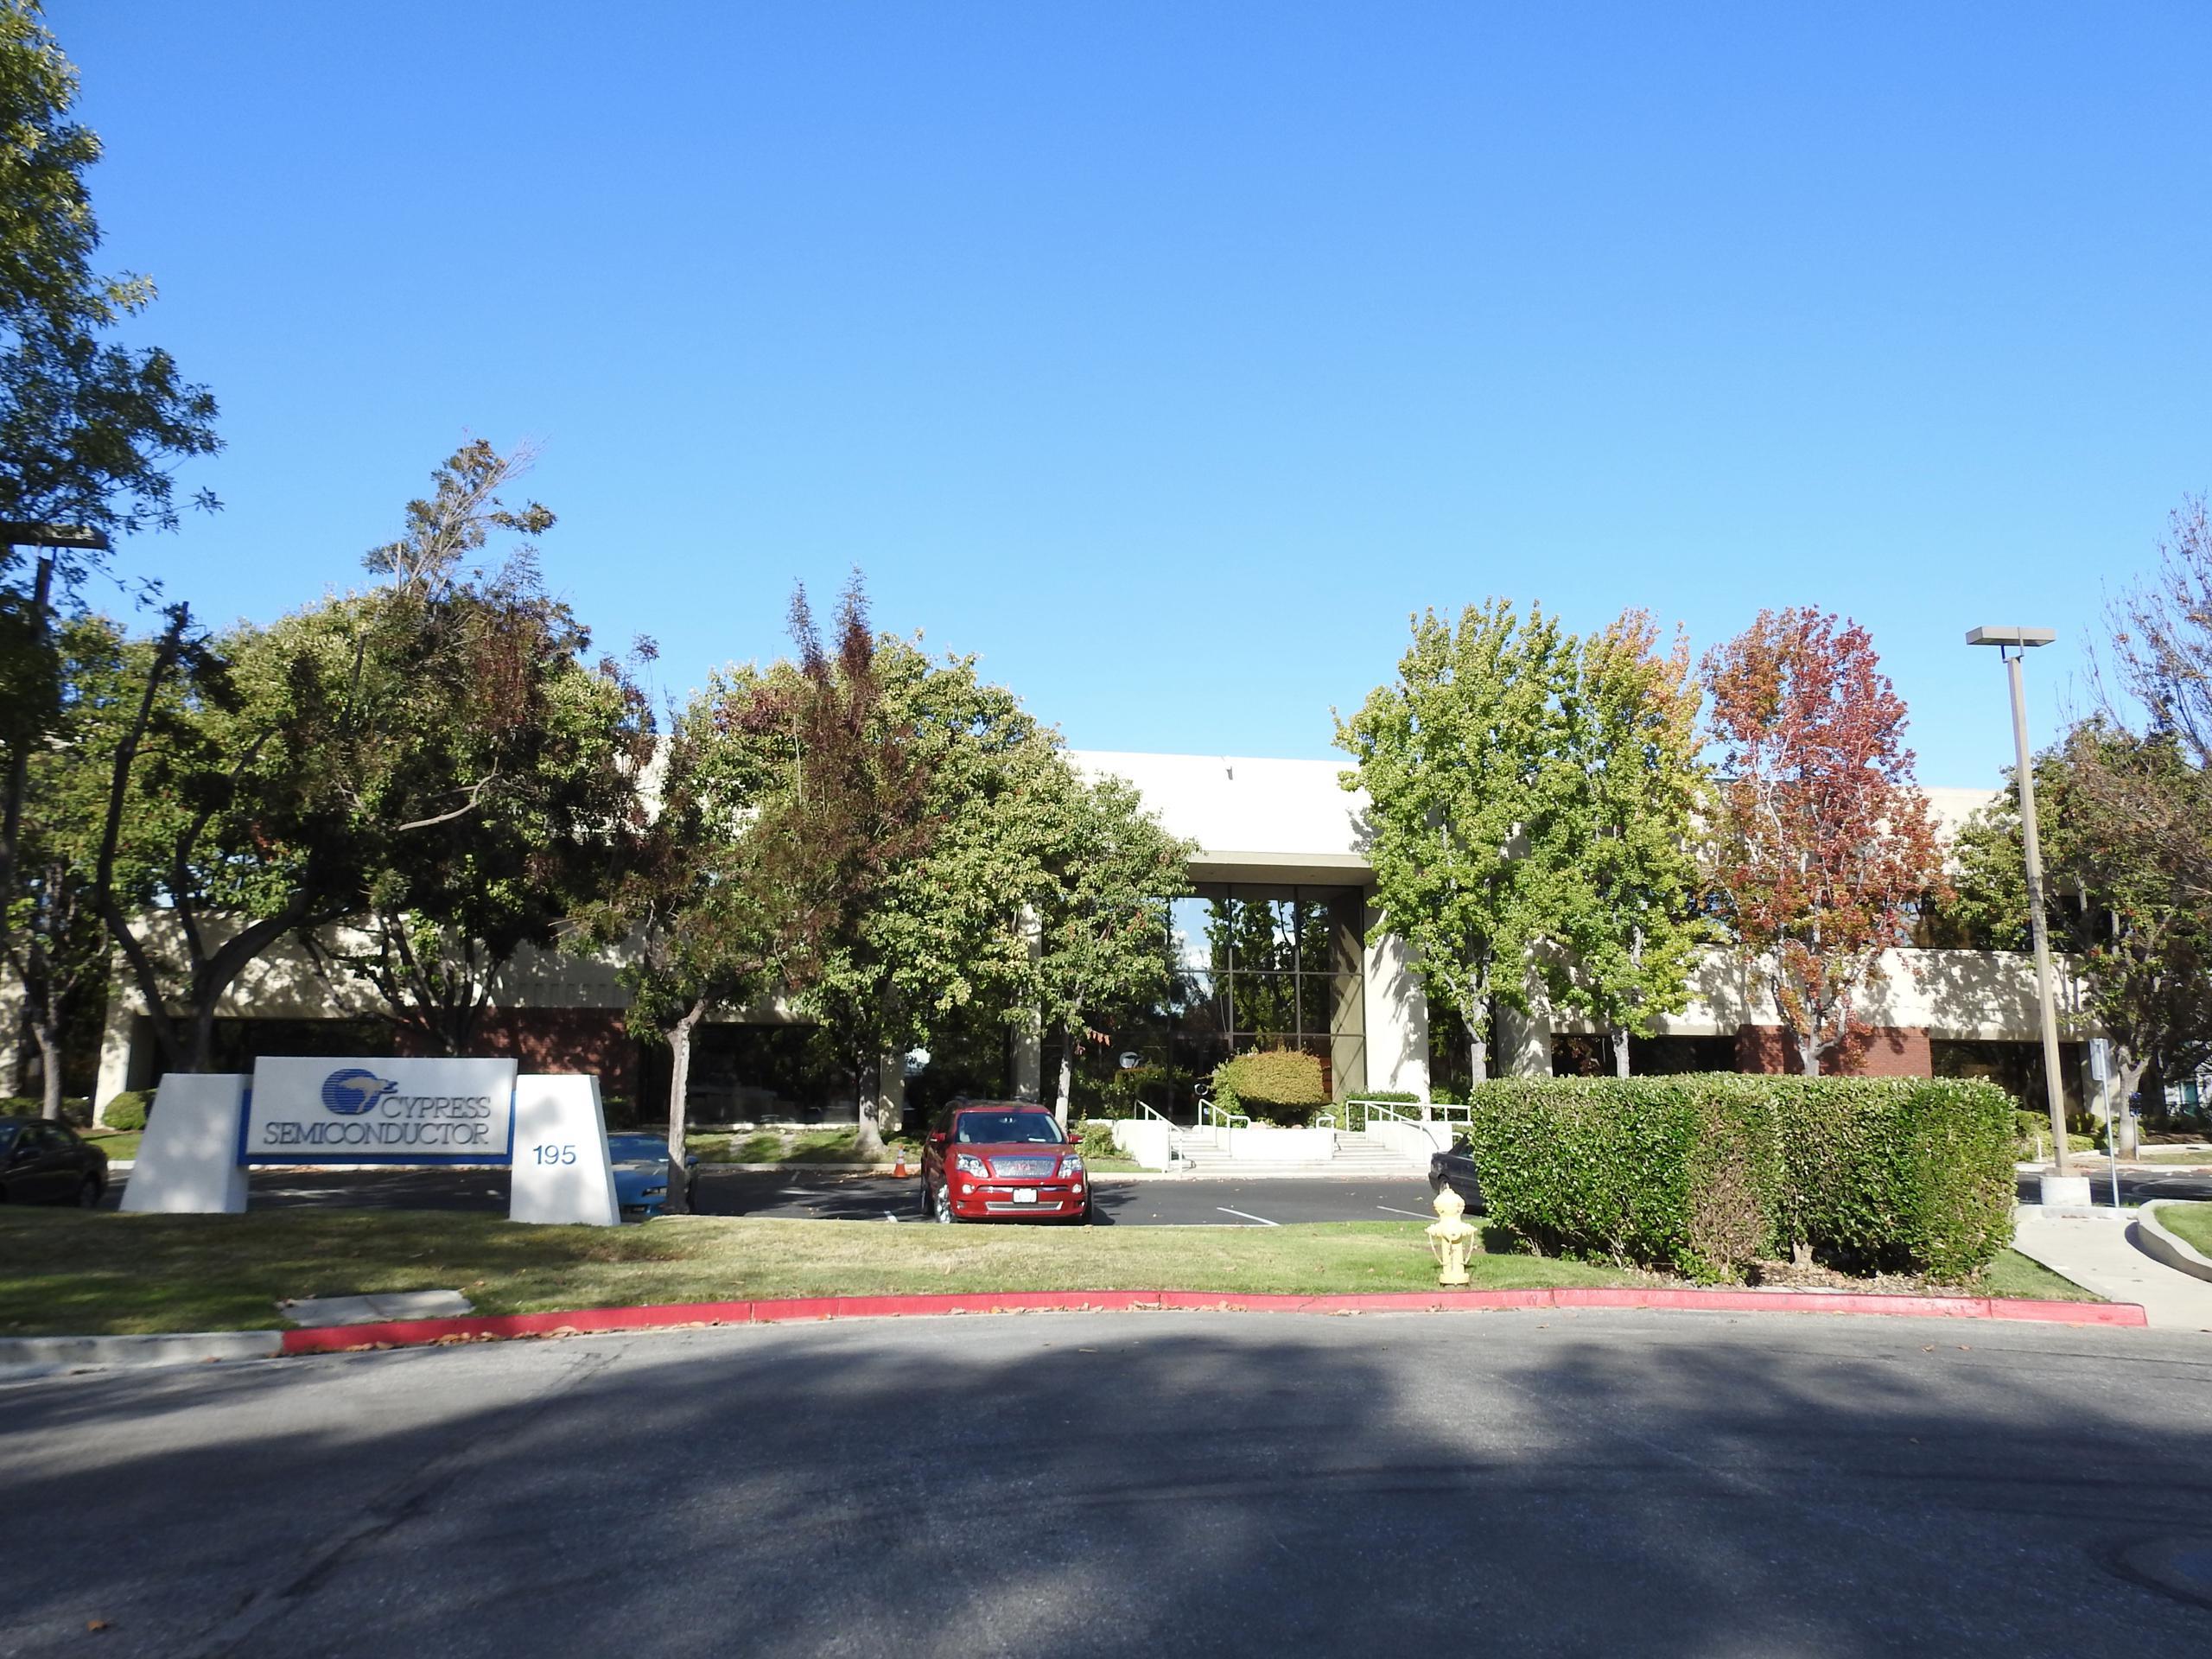 Cypress Semiconductor's corporate headquarters in San Jose, California.